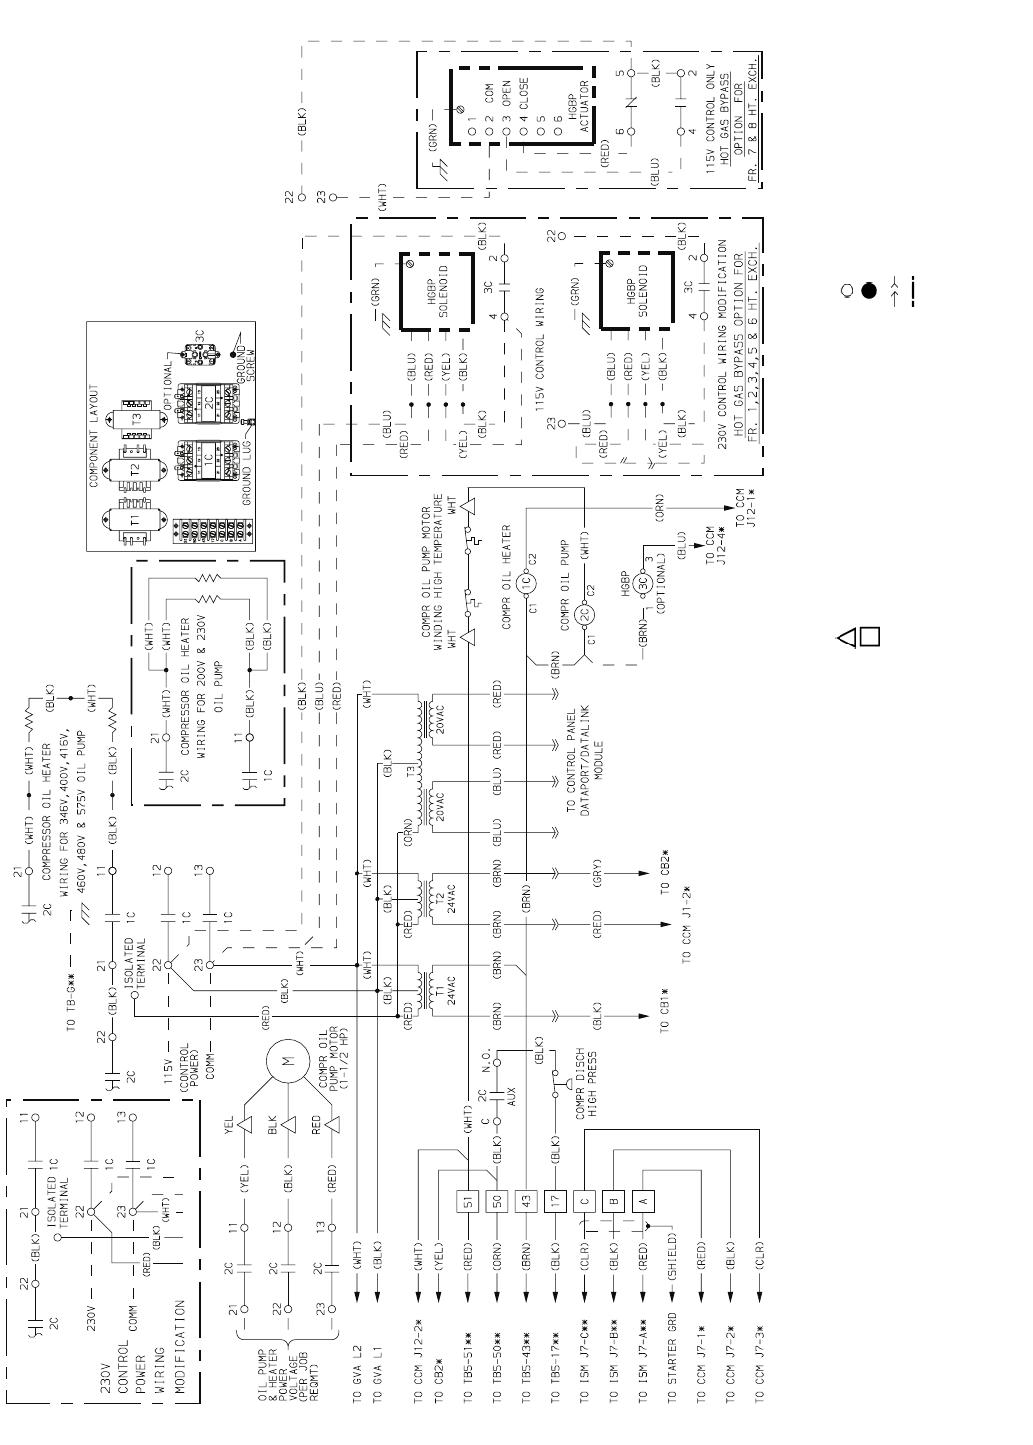 Carrier Chiller Diagram